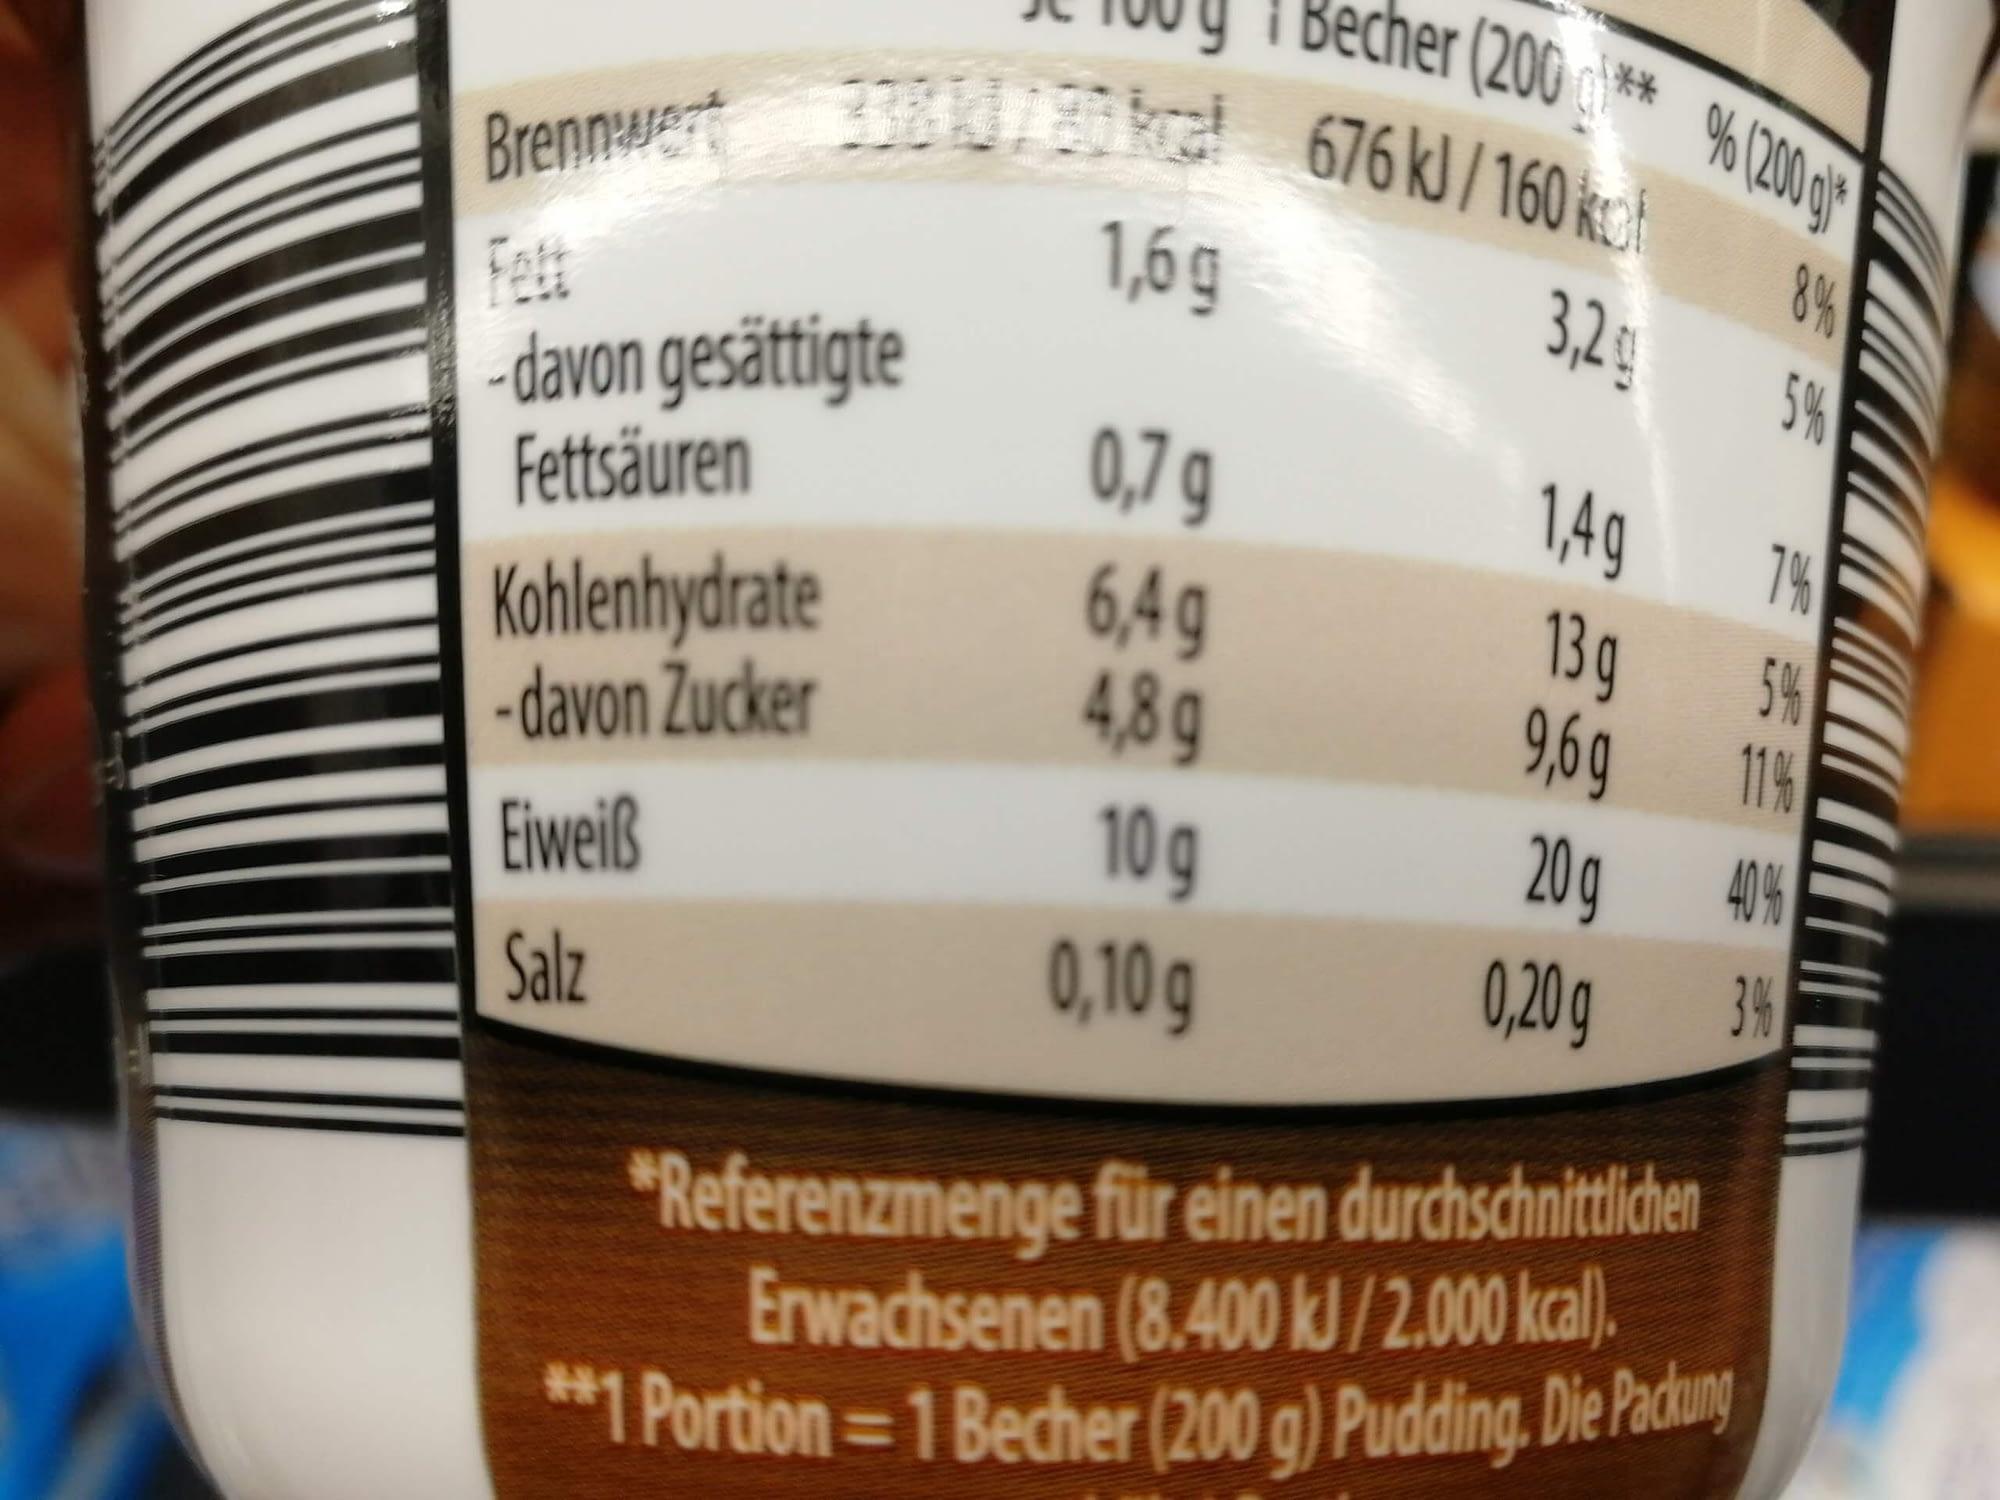 Keto-Snack-Aldi-Protein-Pudding-Nährwerte